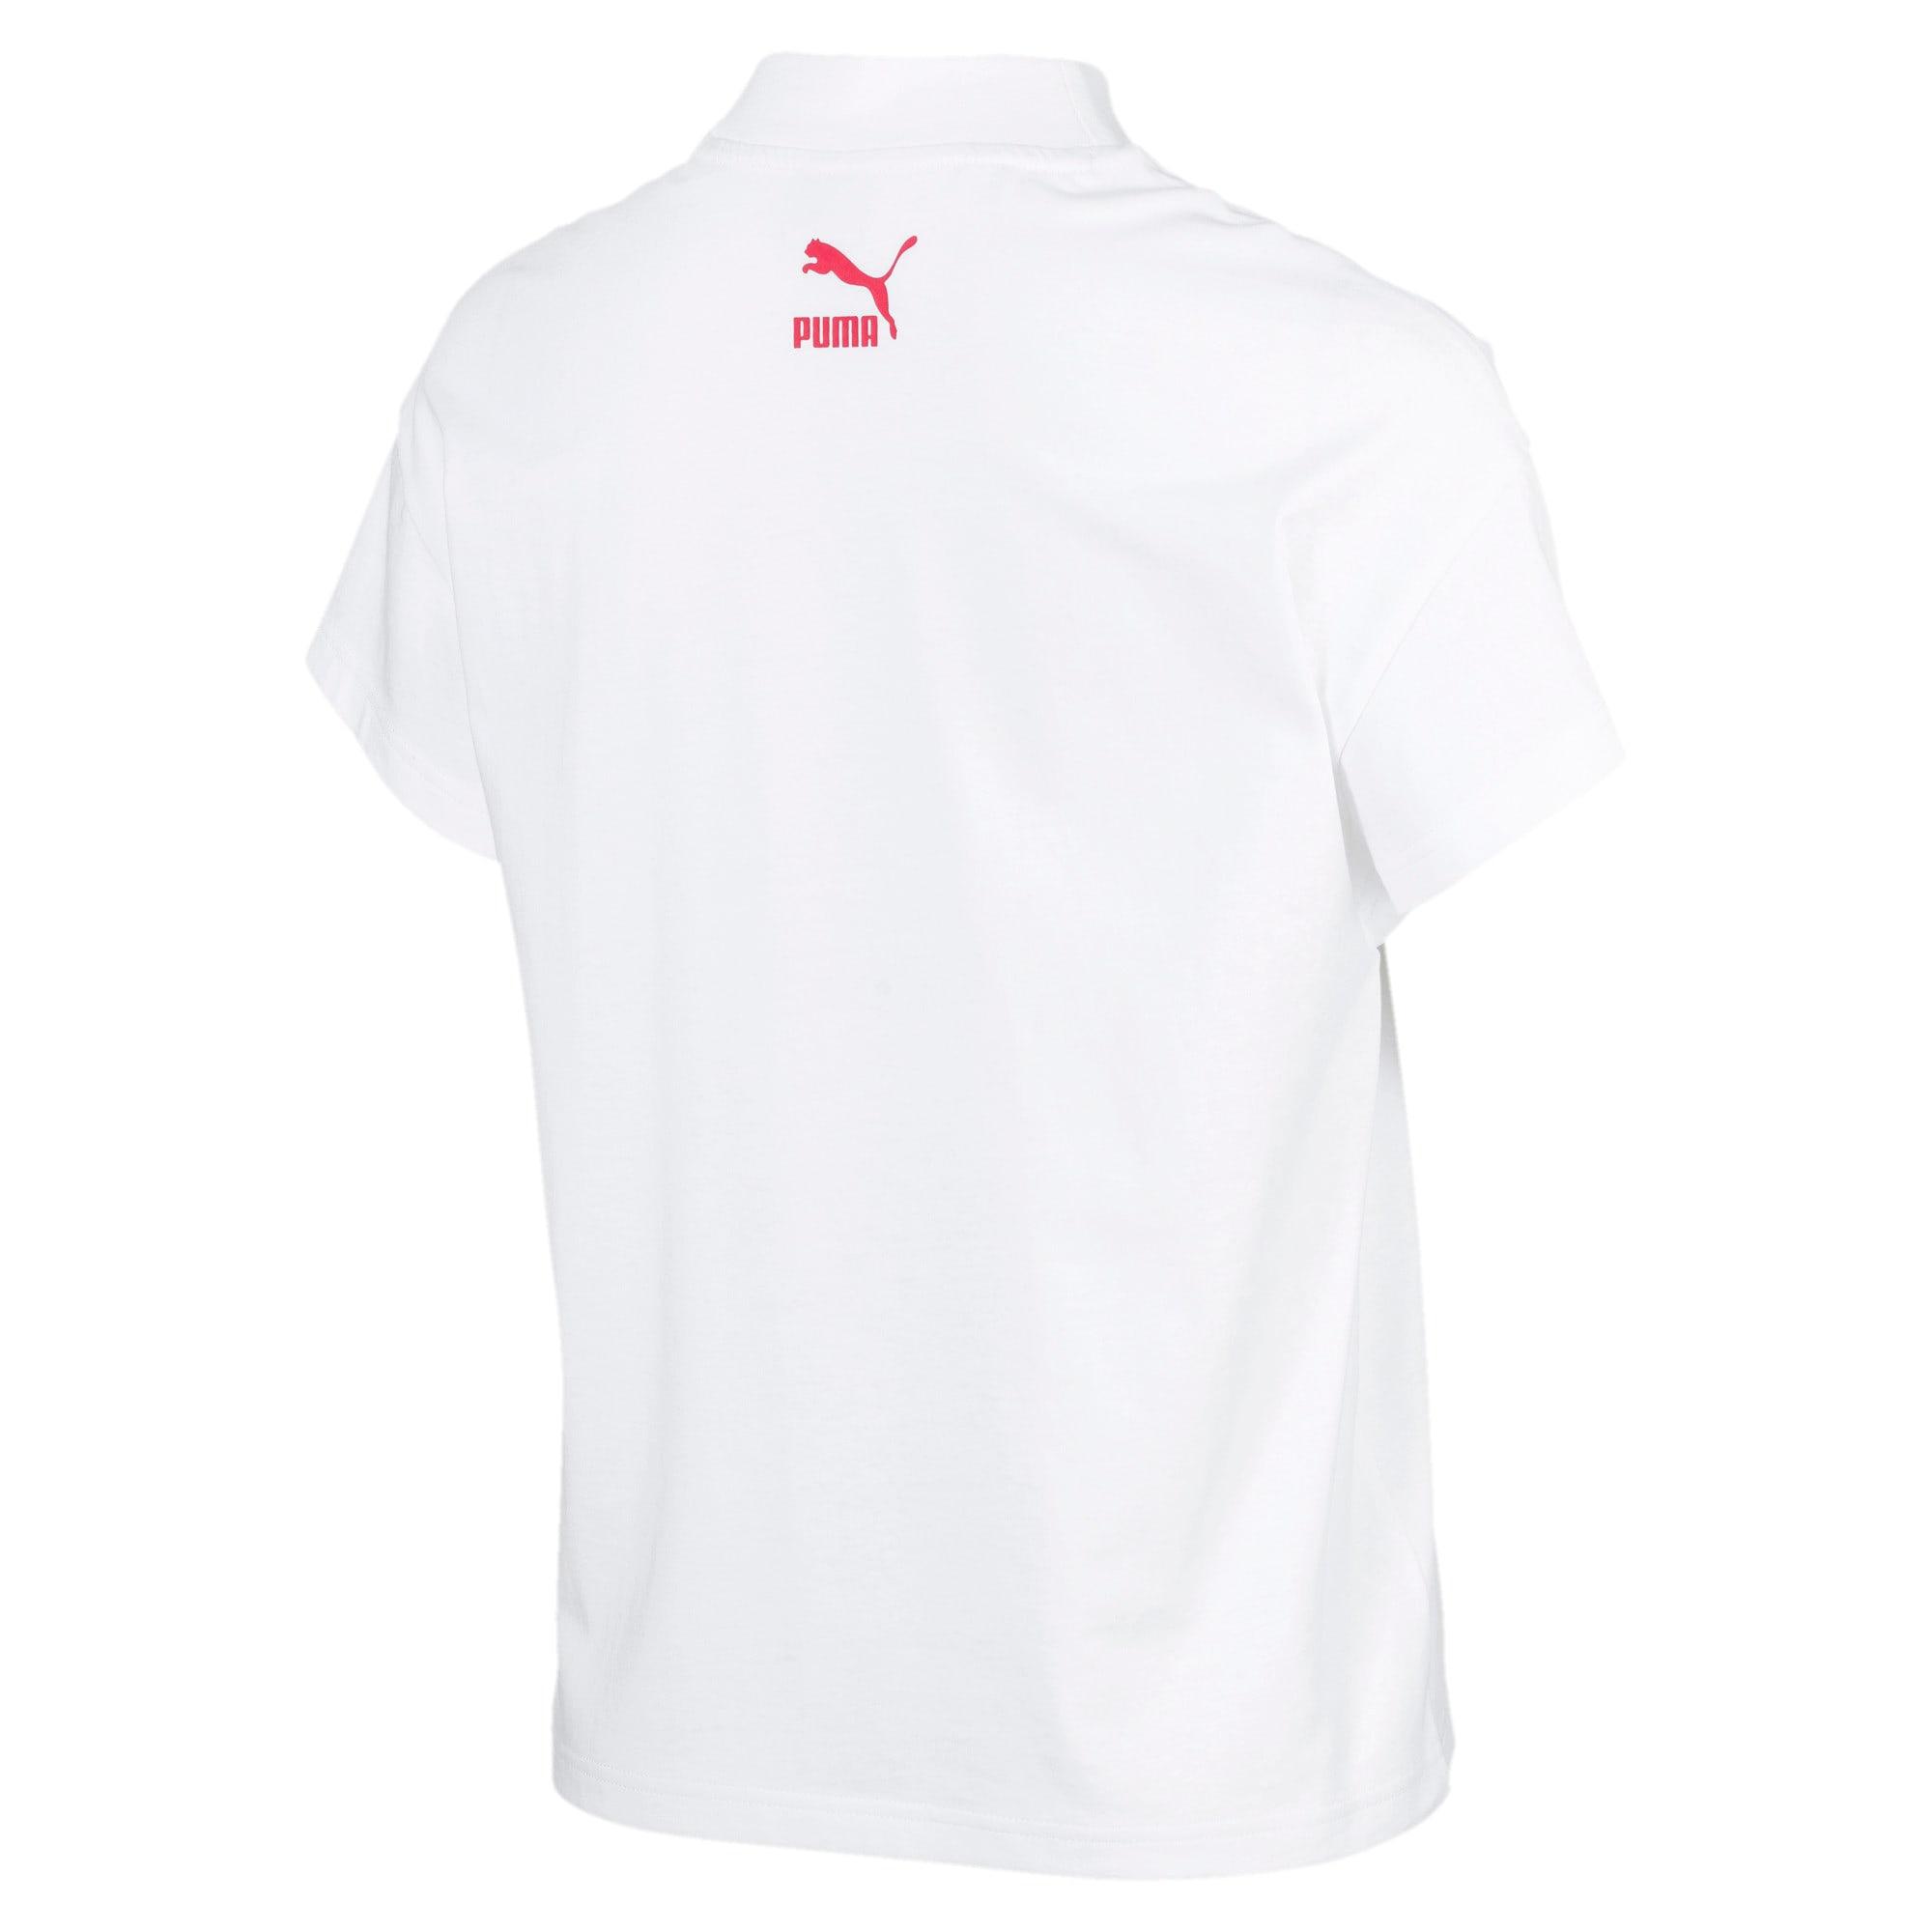 Thumbnail 4 of PUMA XTG グラフィック ウィメンズ SS Tシャツ 半袖, Puma White, medium-JPN